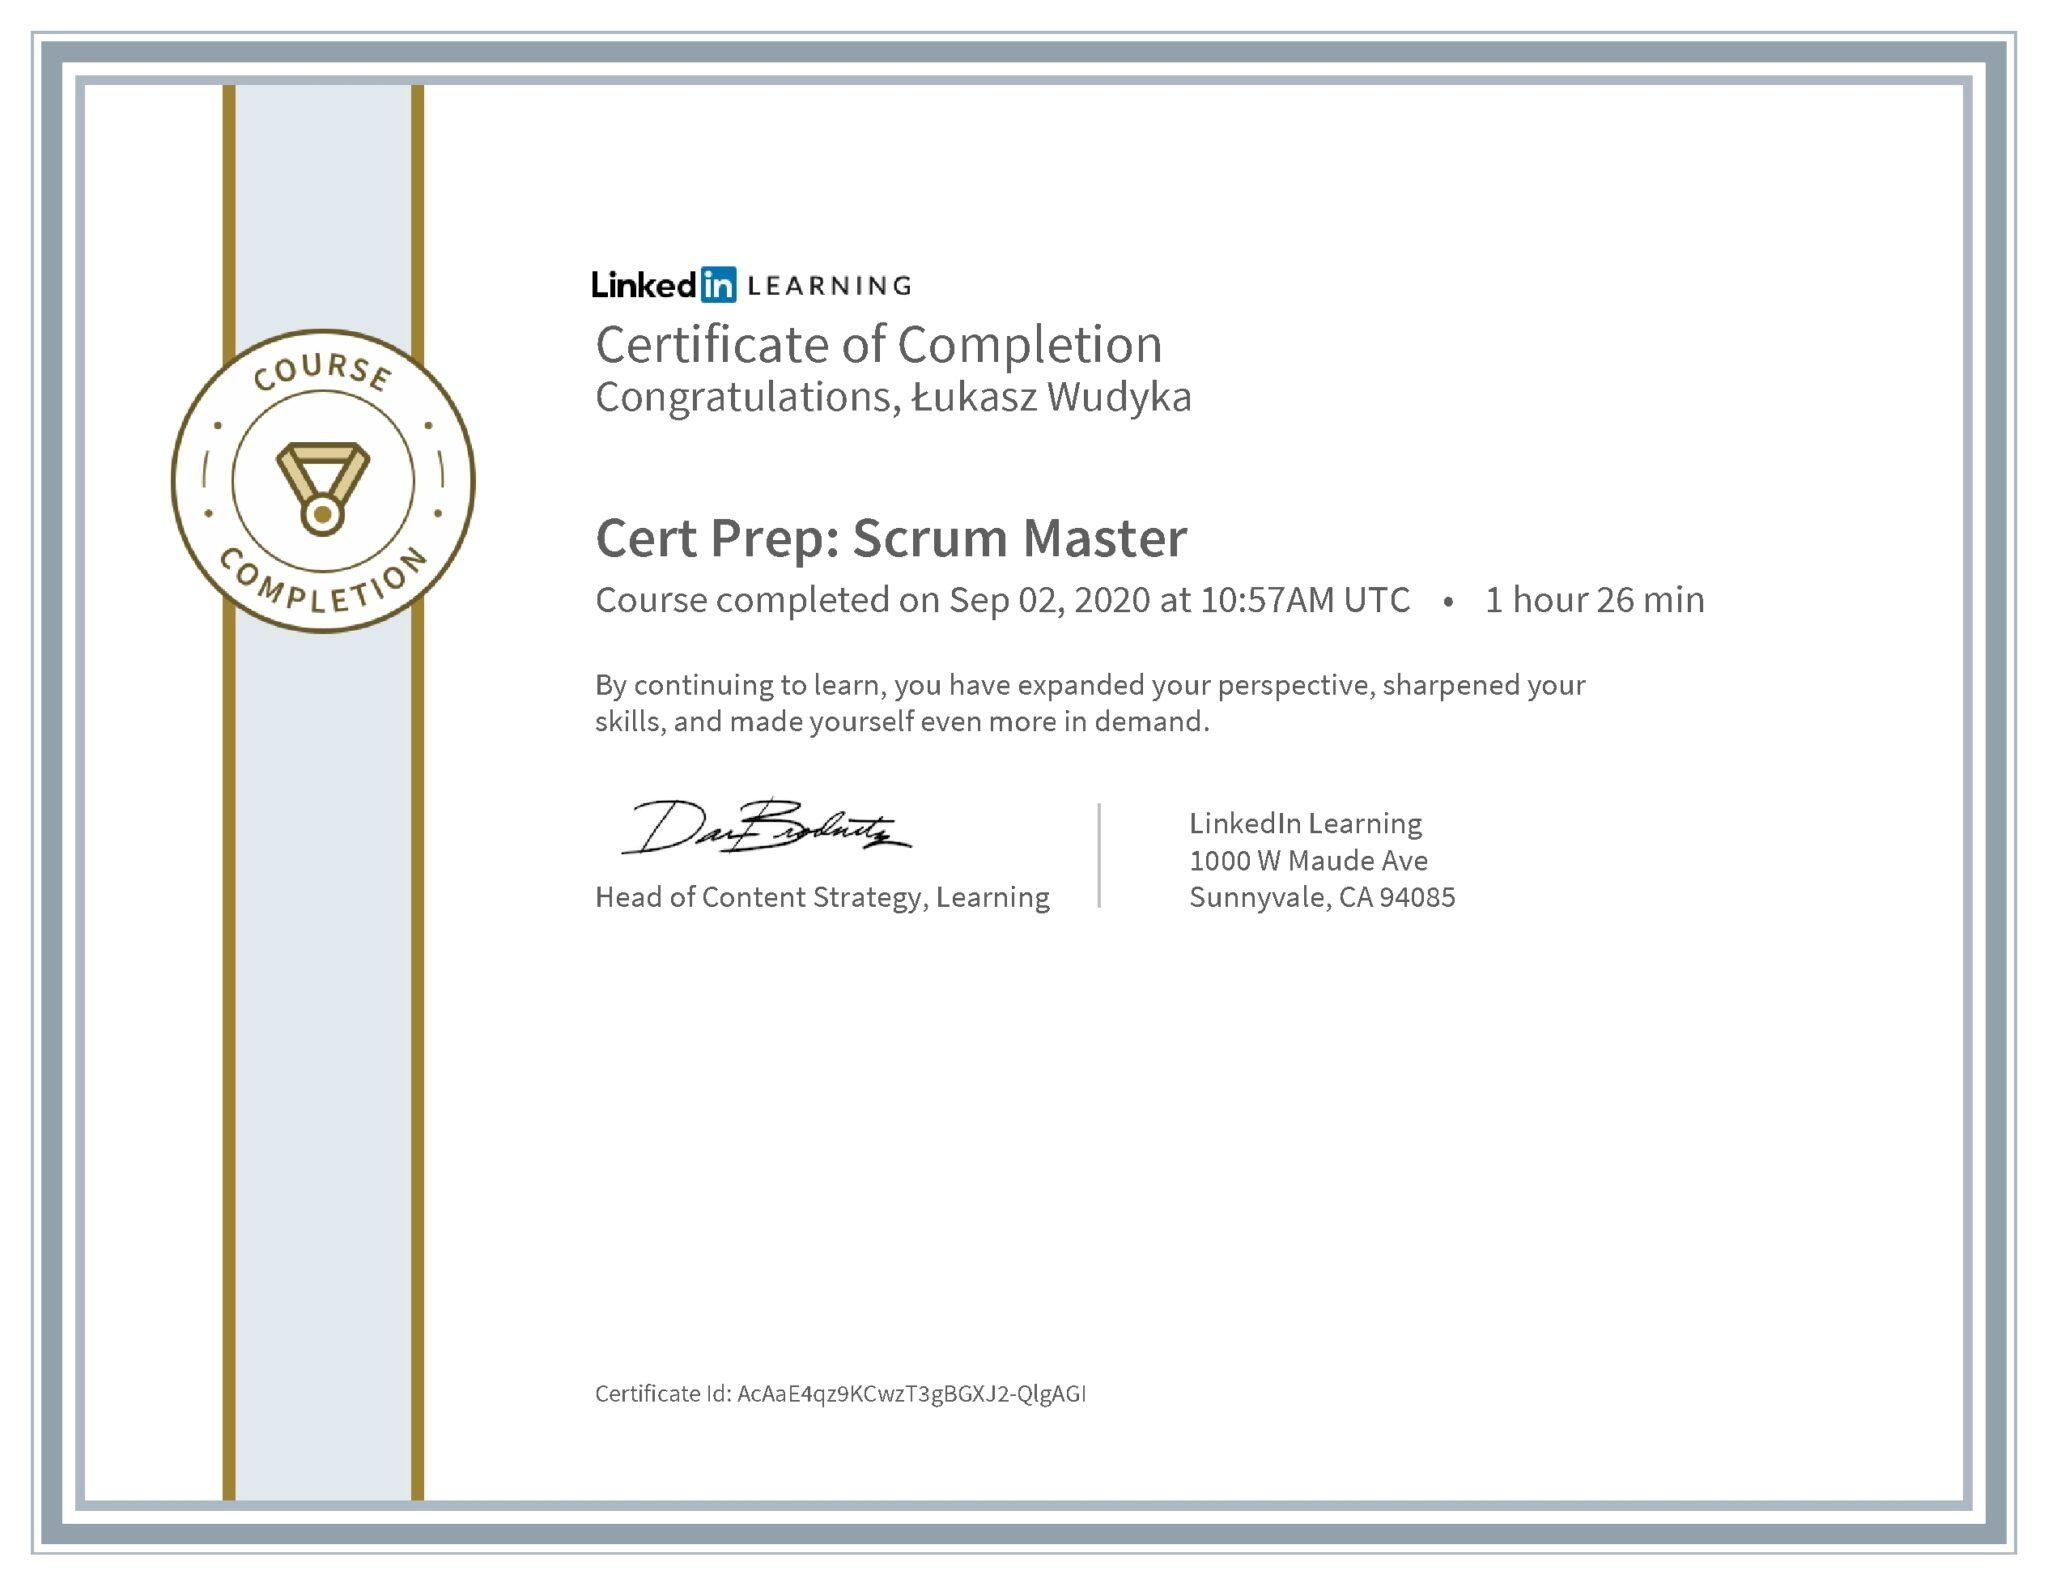 Łukasz Wudyka certyfikat LinkedIn Cert Prep: Scrum Master